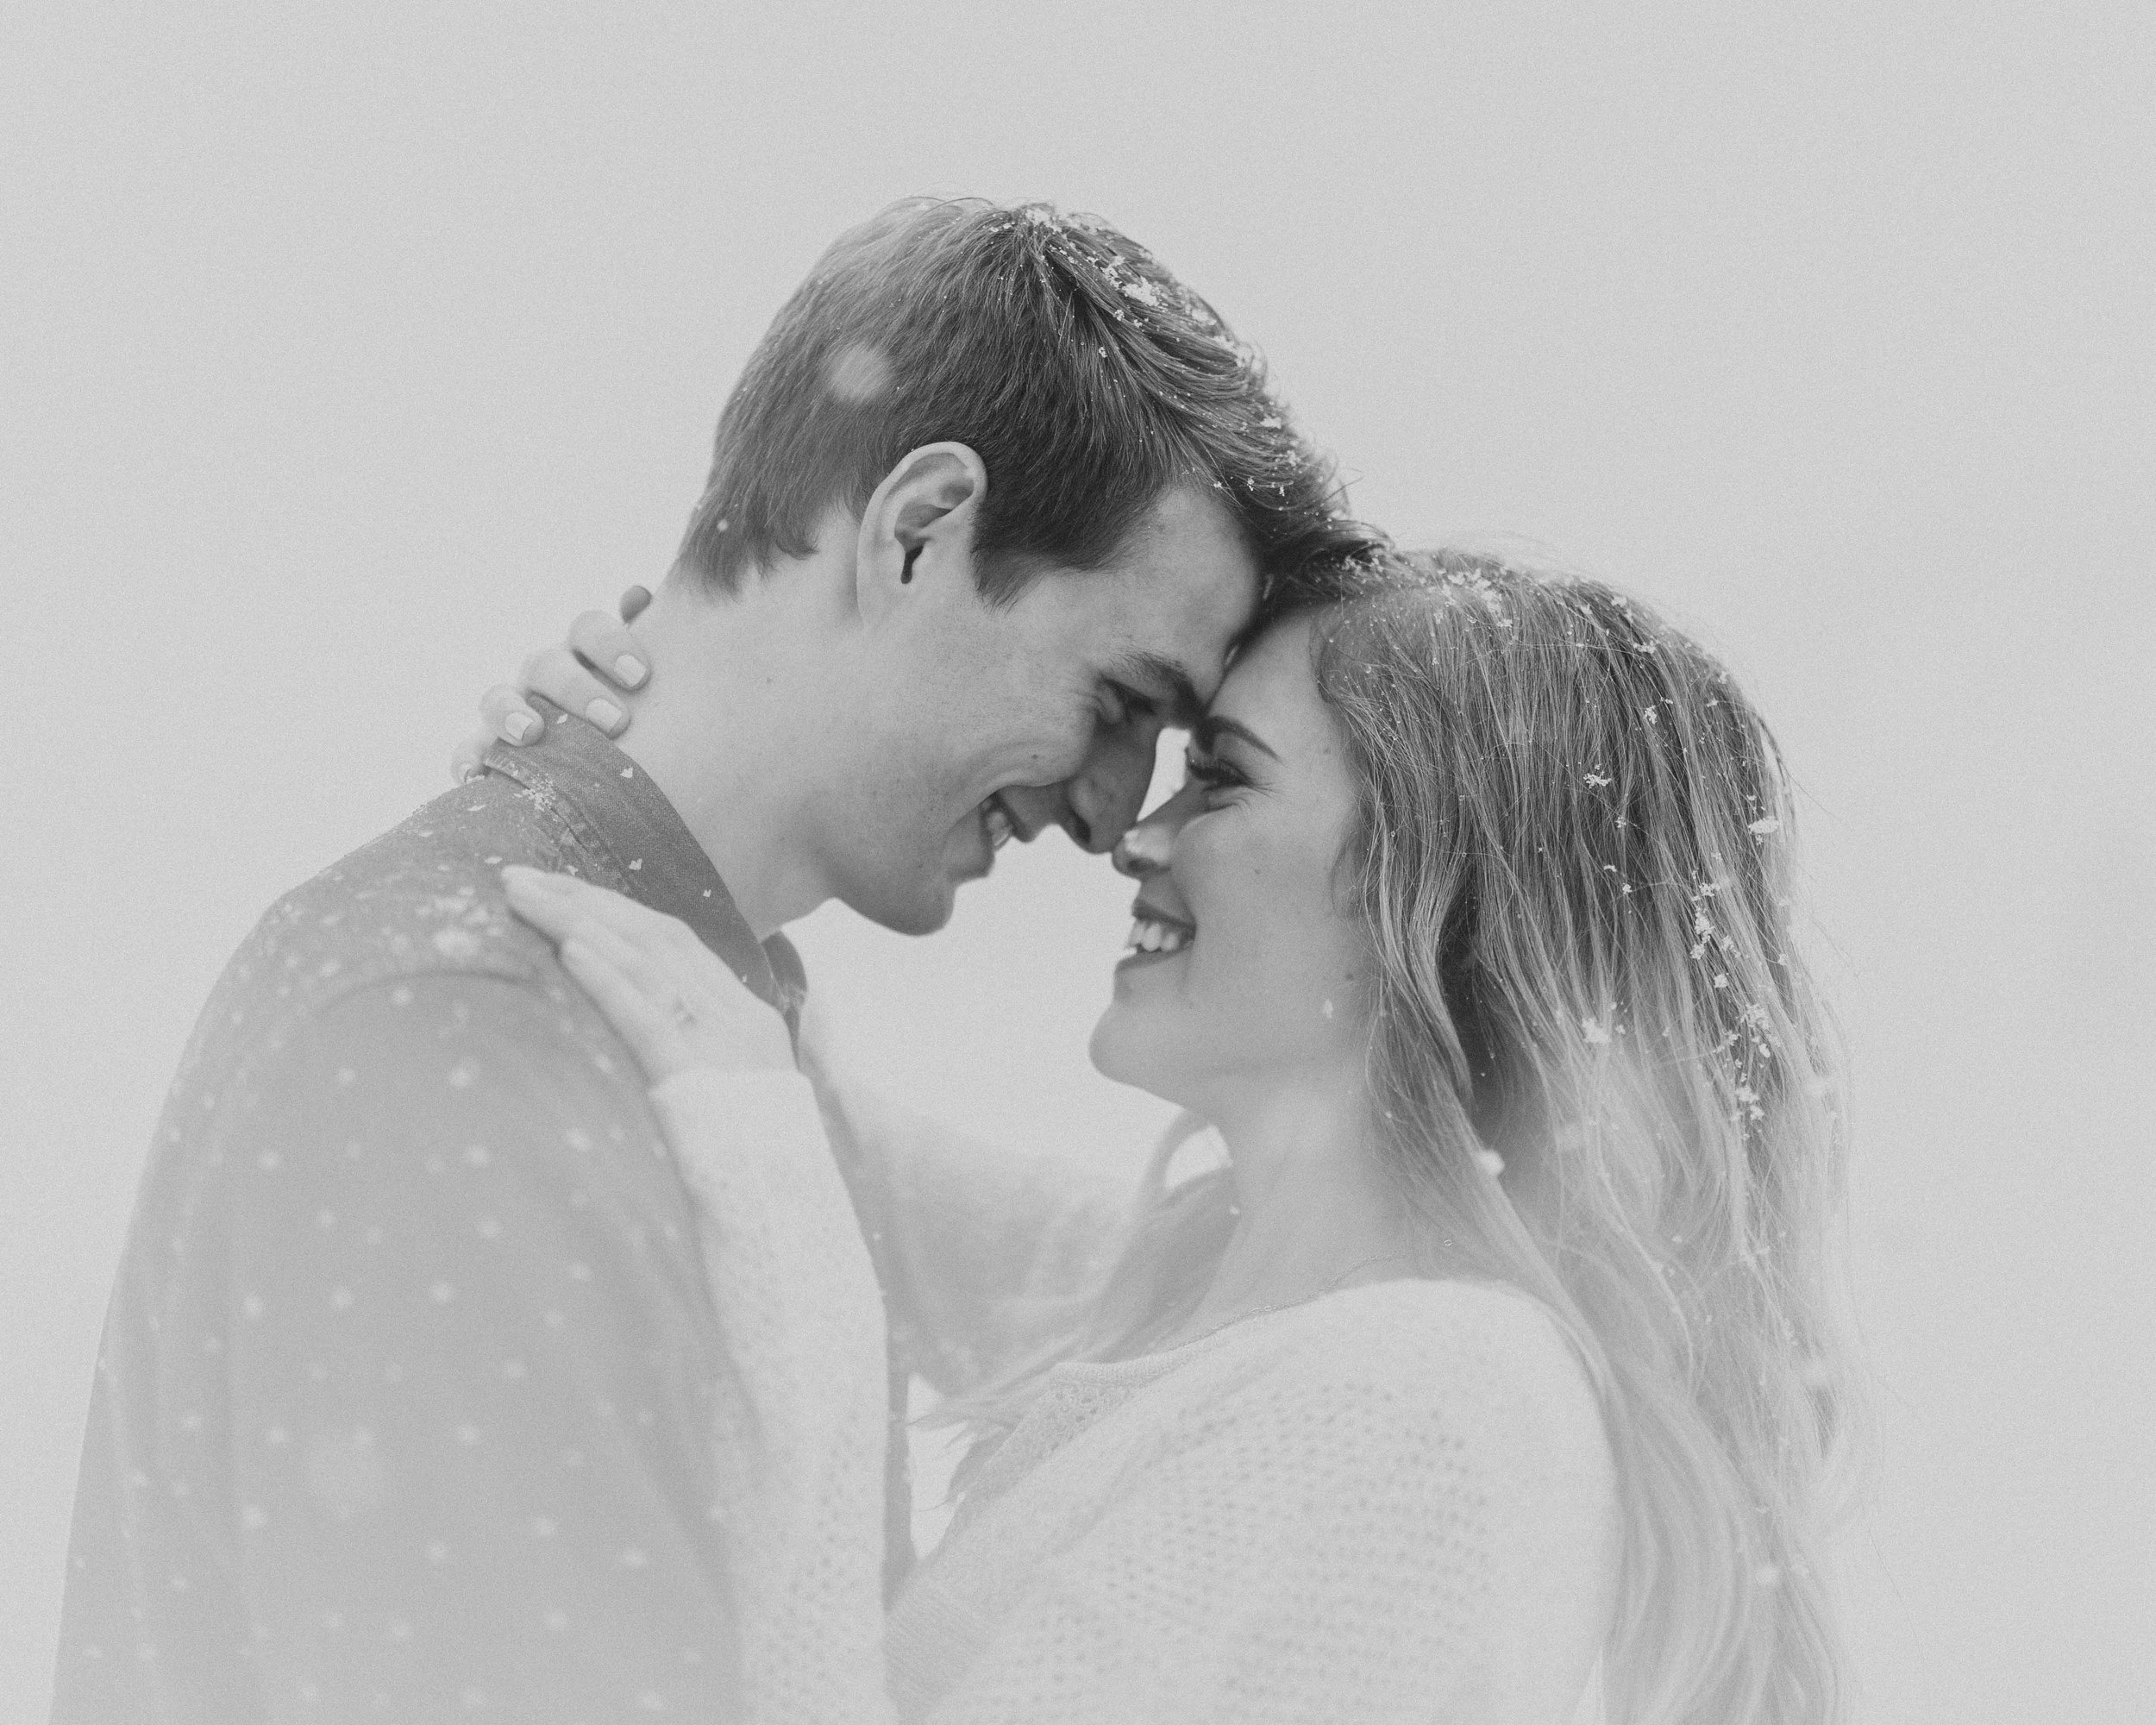 Salt-Lake-City-Utah-Wedding-Photographer-Engagement-15.jpg